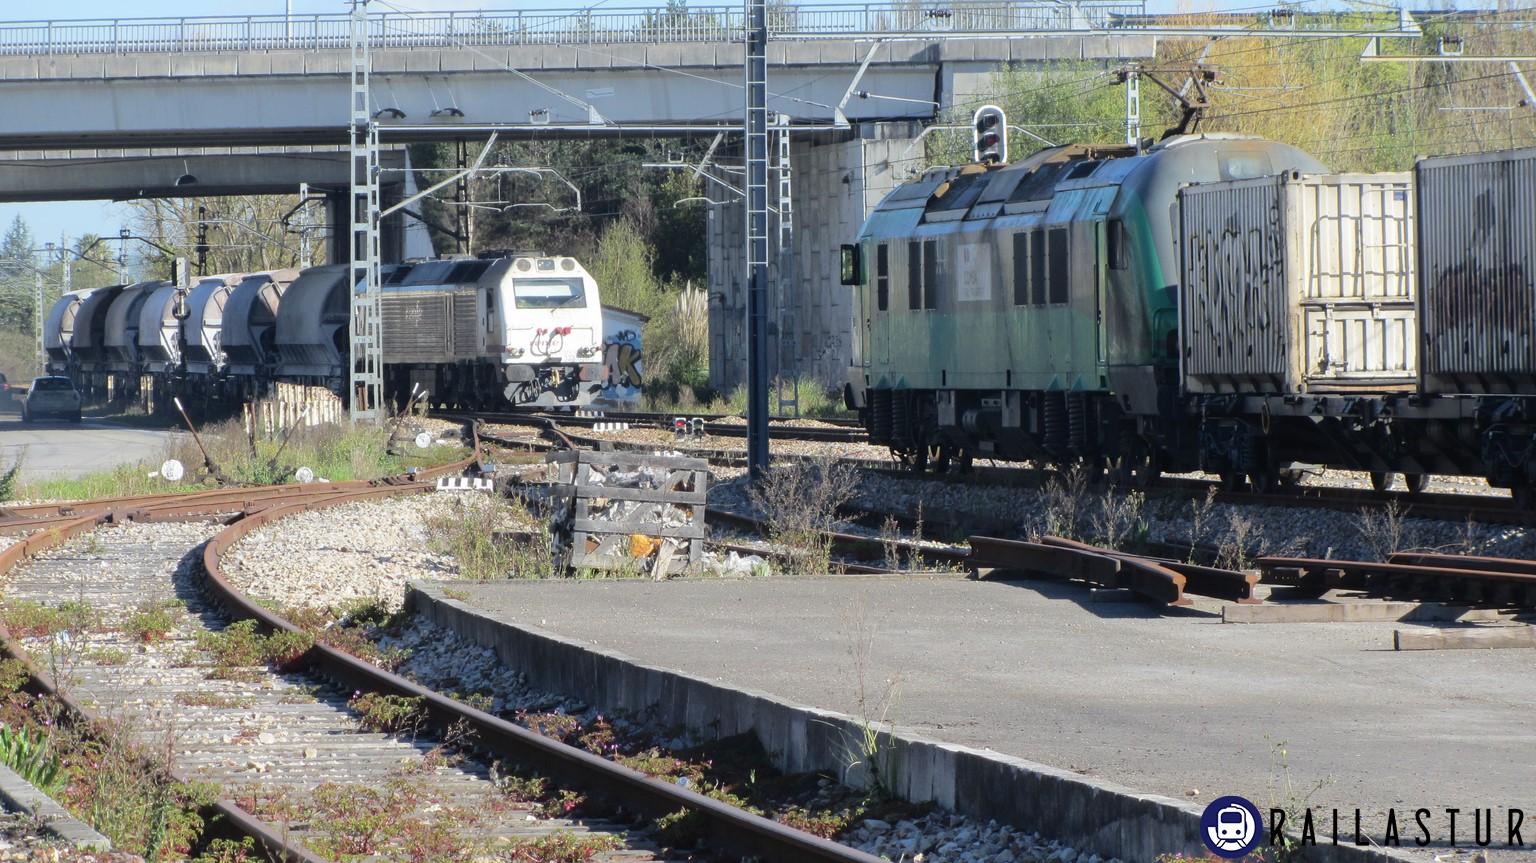 Cruce de tren de Comsa y de Renfe en Viella (2016)